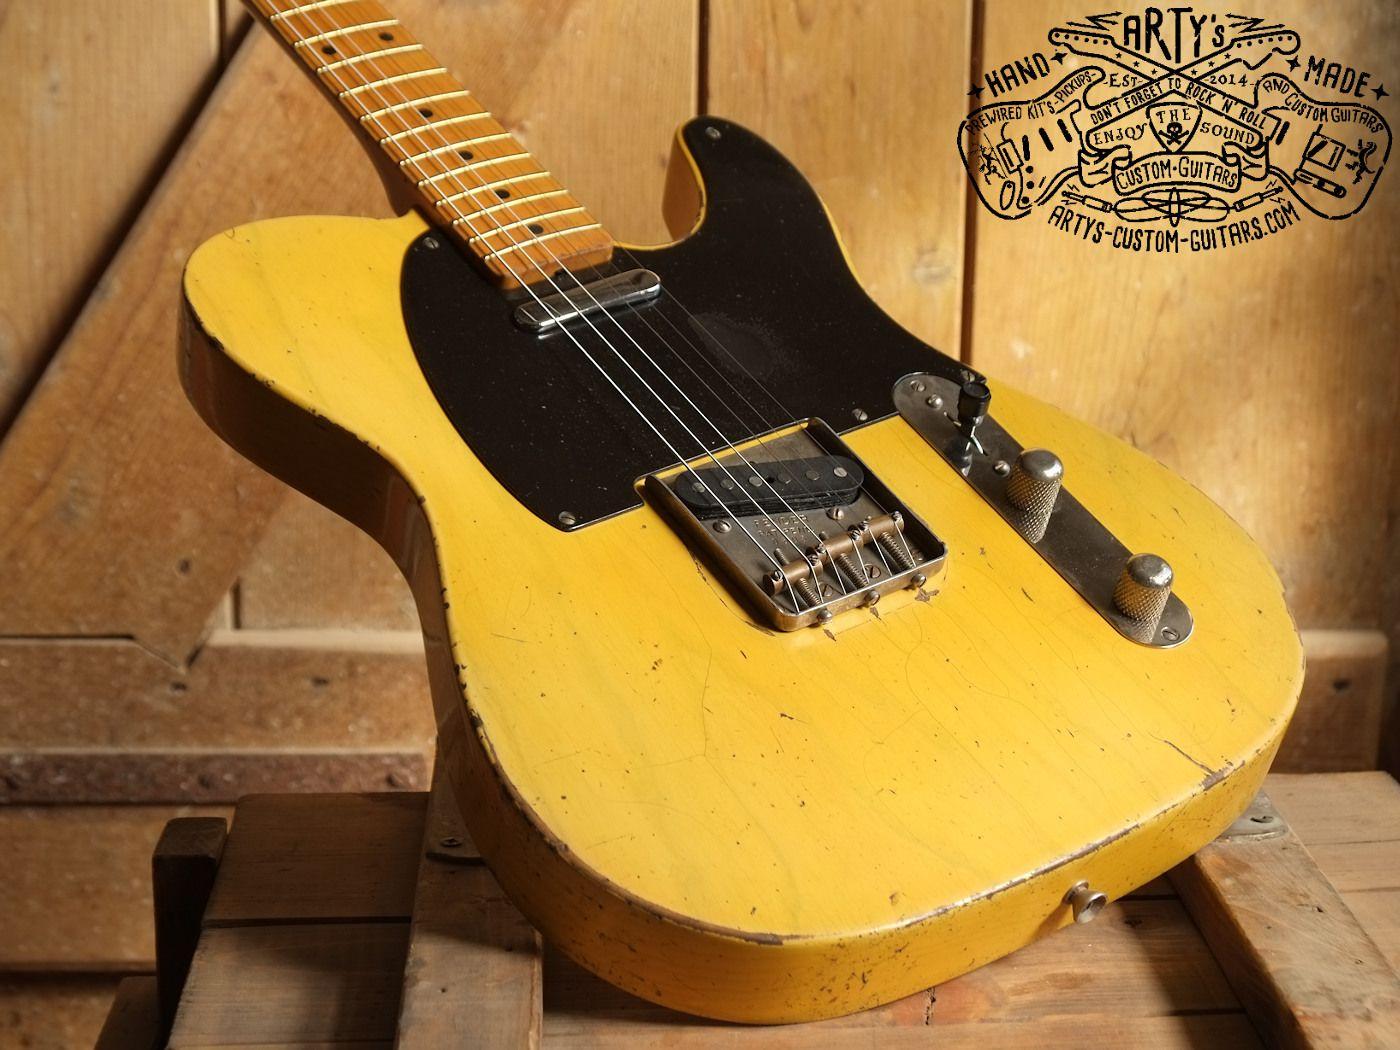 Nocaster 1950 Arty S Relic Repro Broadcaster Blackguard Tele Telecaster Arty S Custom Guitars Guitar Fender Vintage Telecaster